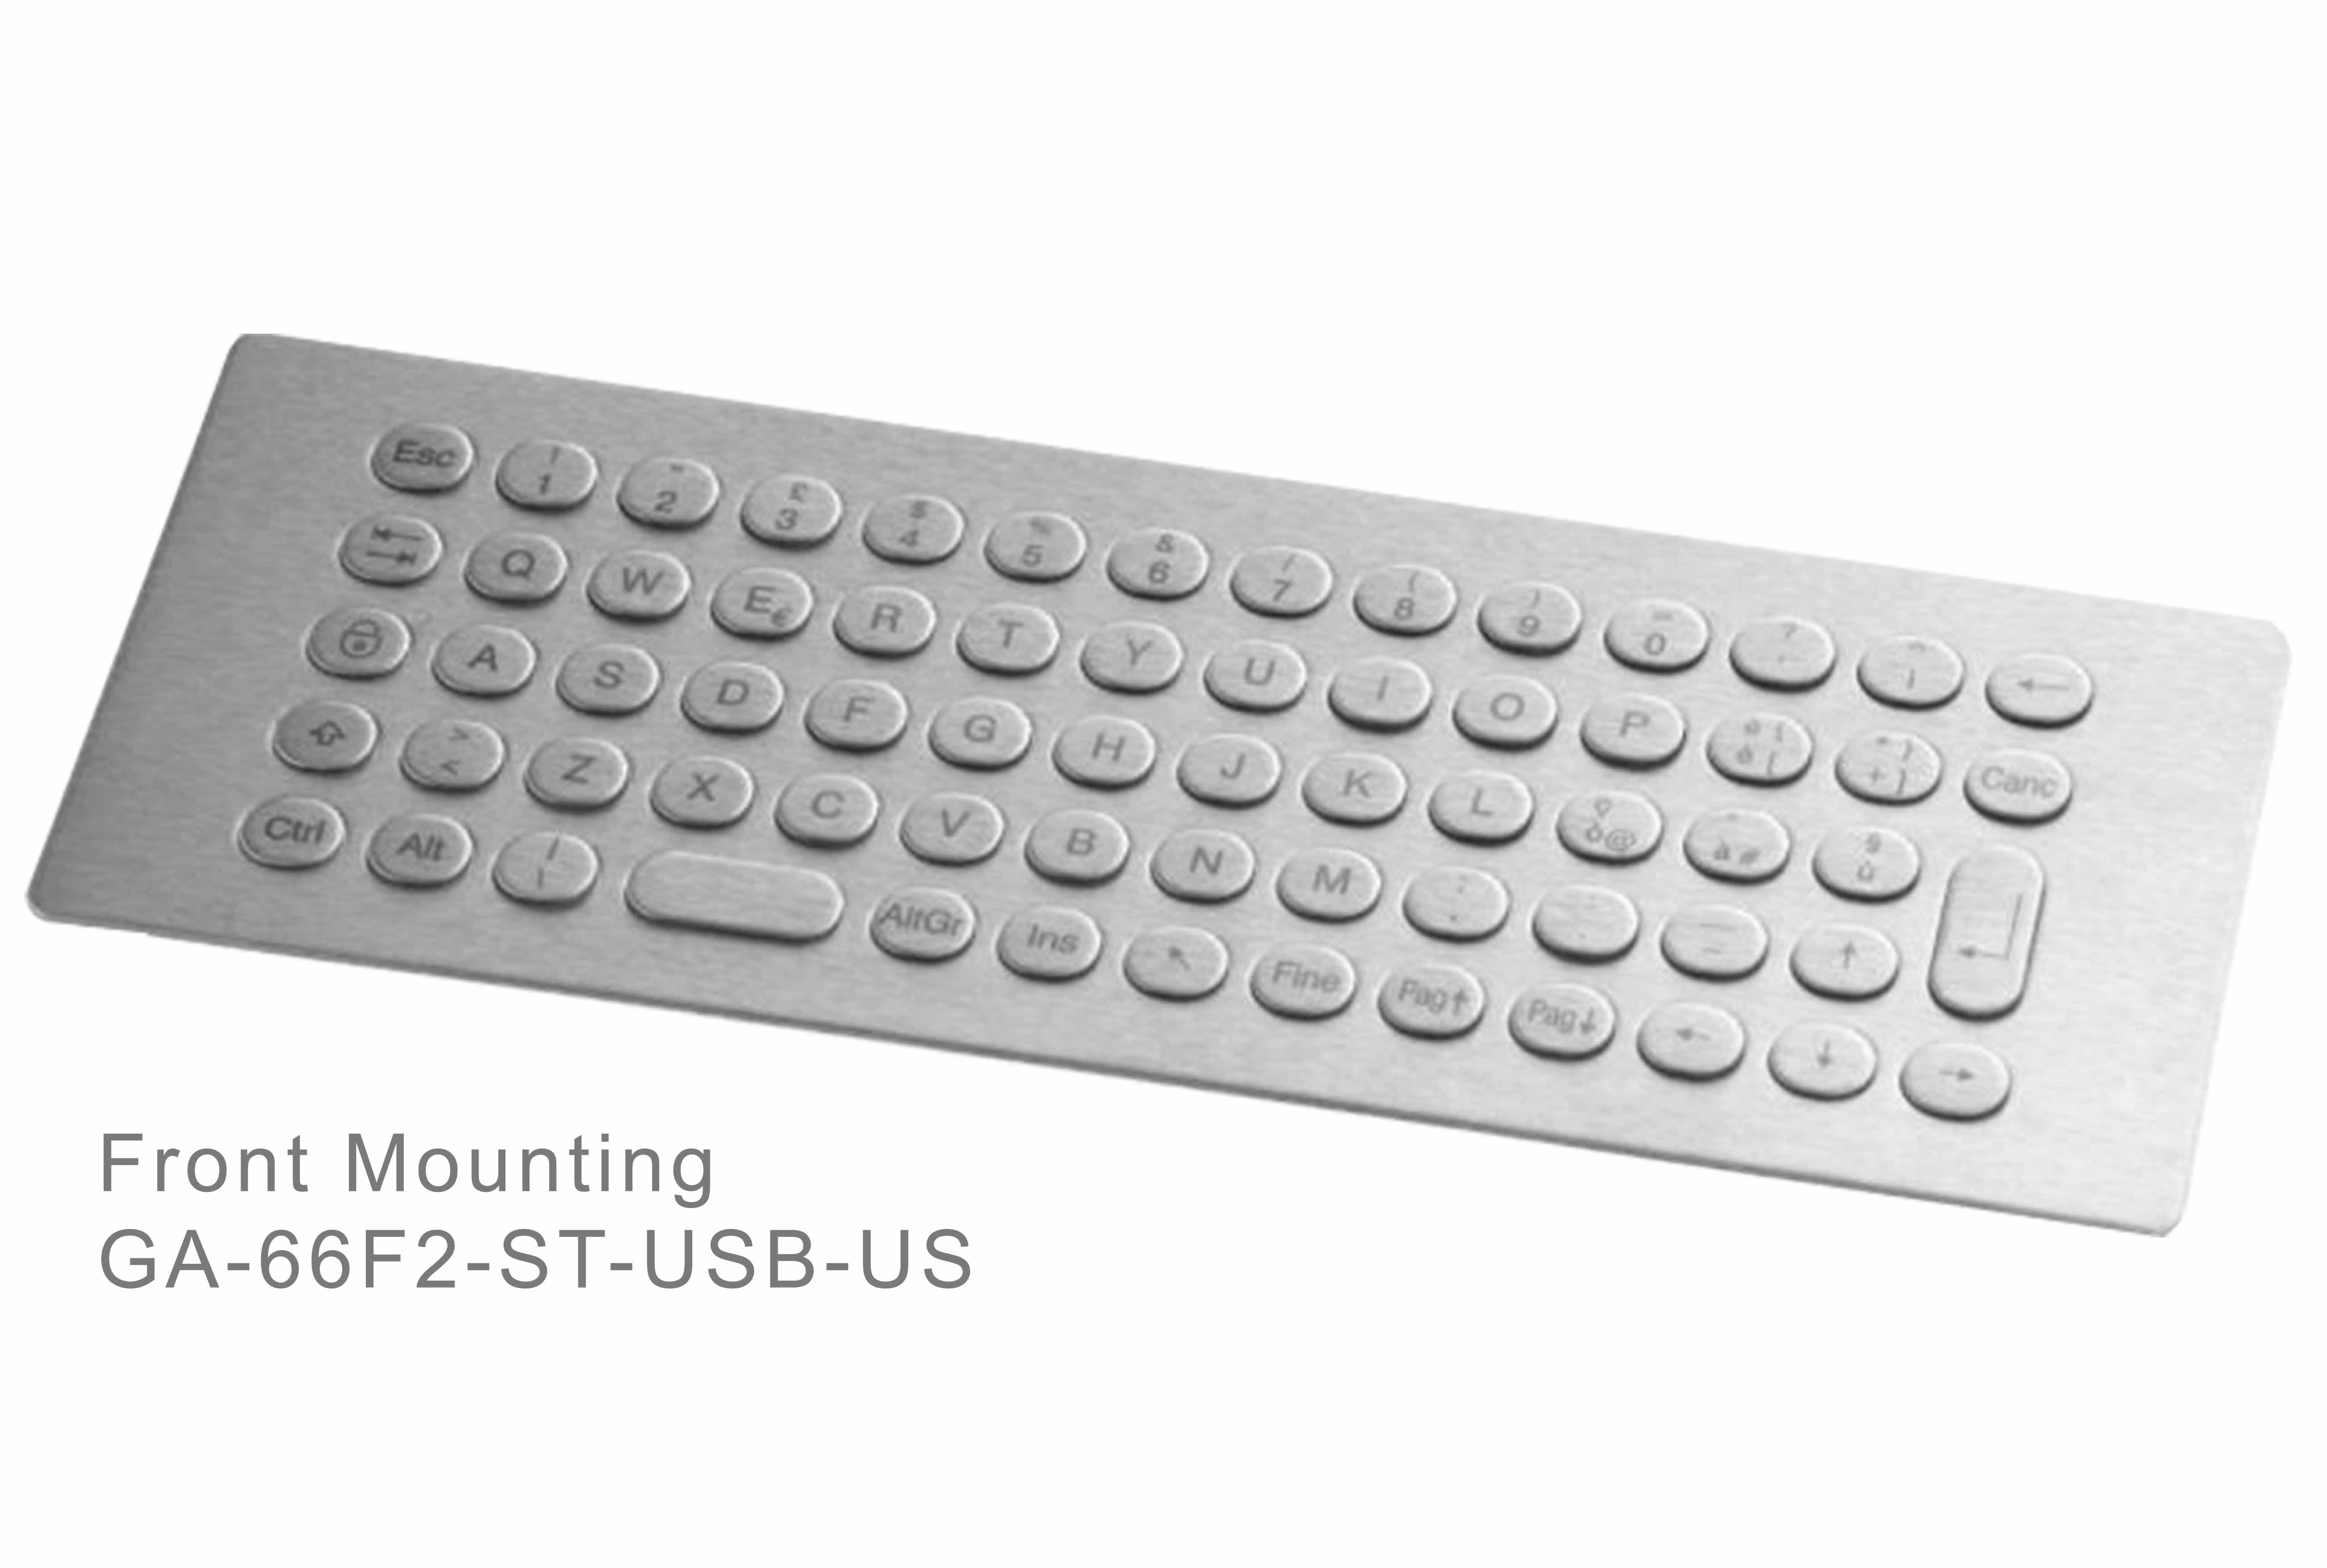 GA-Industrial-Italian Brand-60+Keys Front Mounting-L